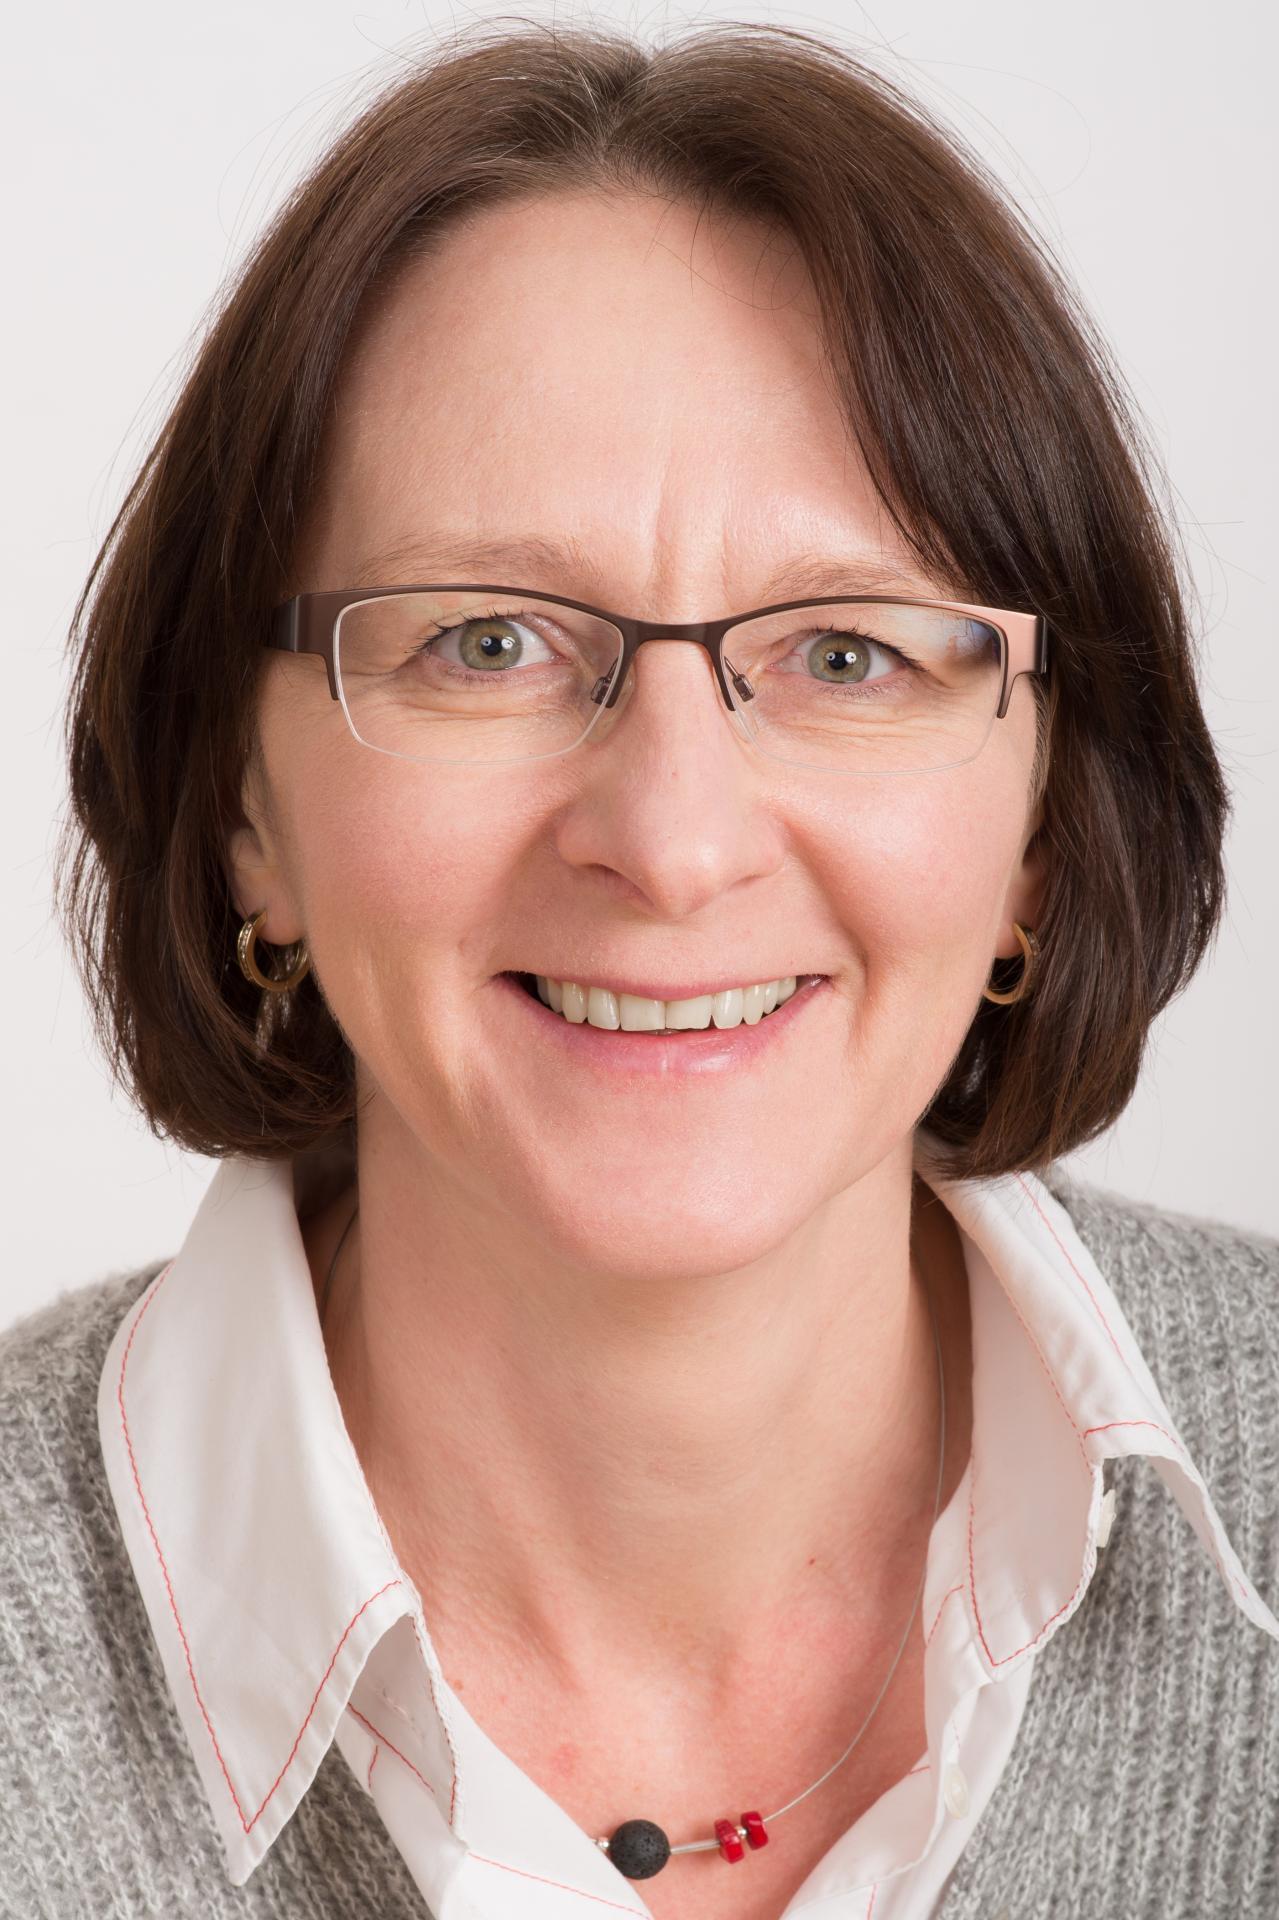 Lilia Dörr